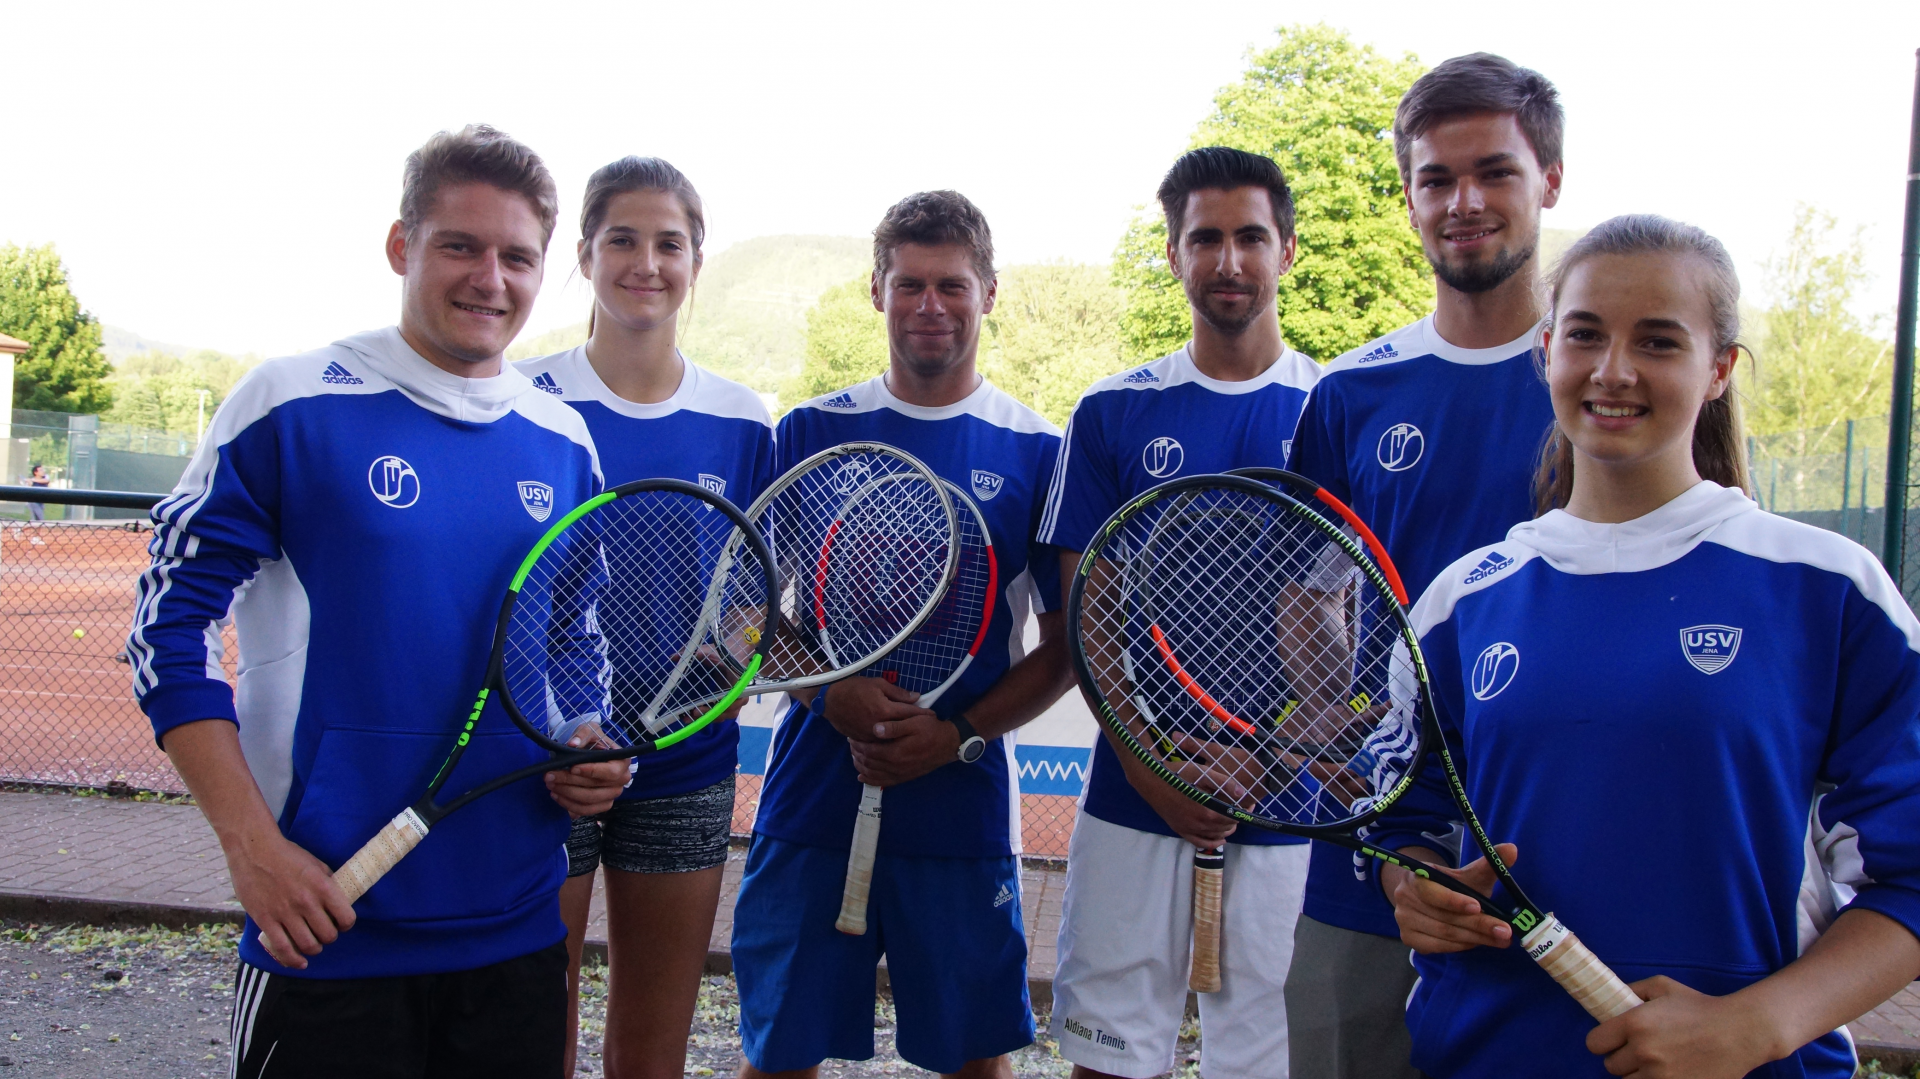 Tennisschule Tom Schilke